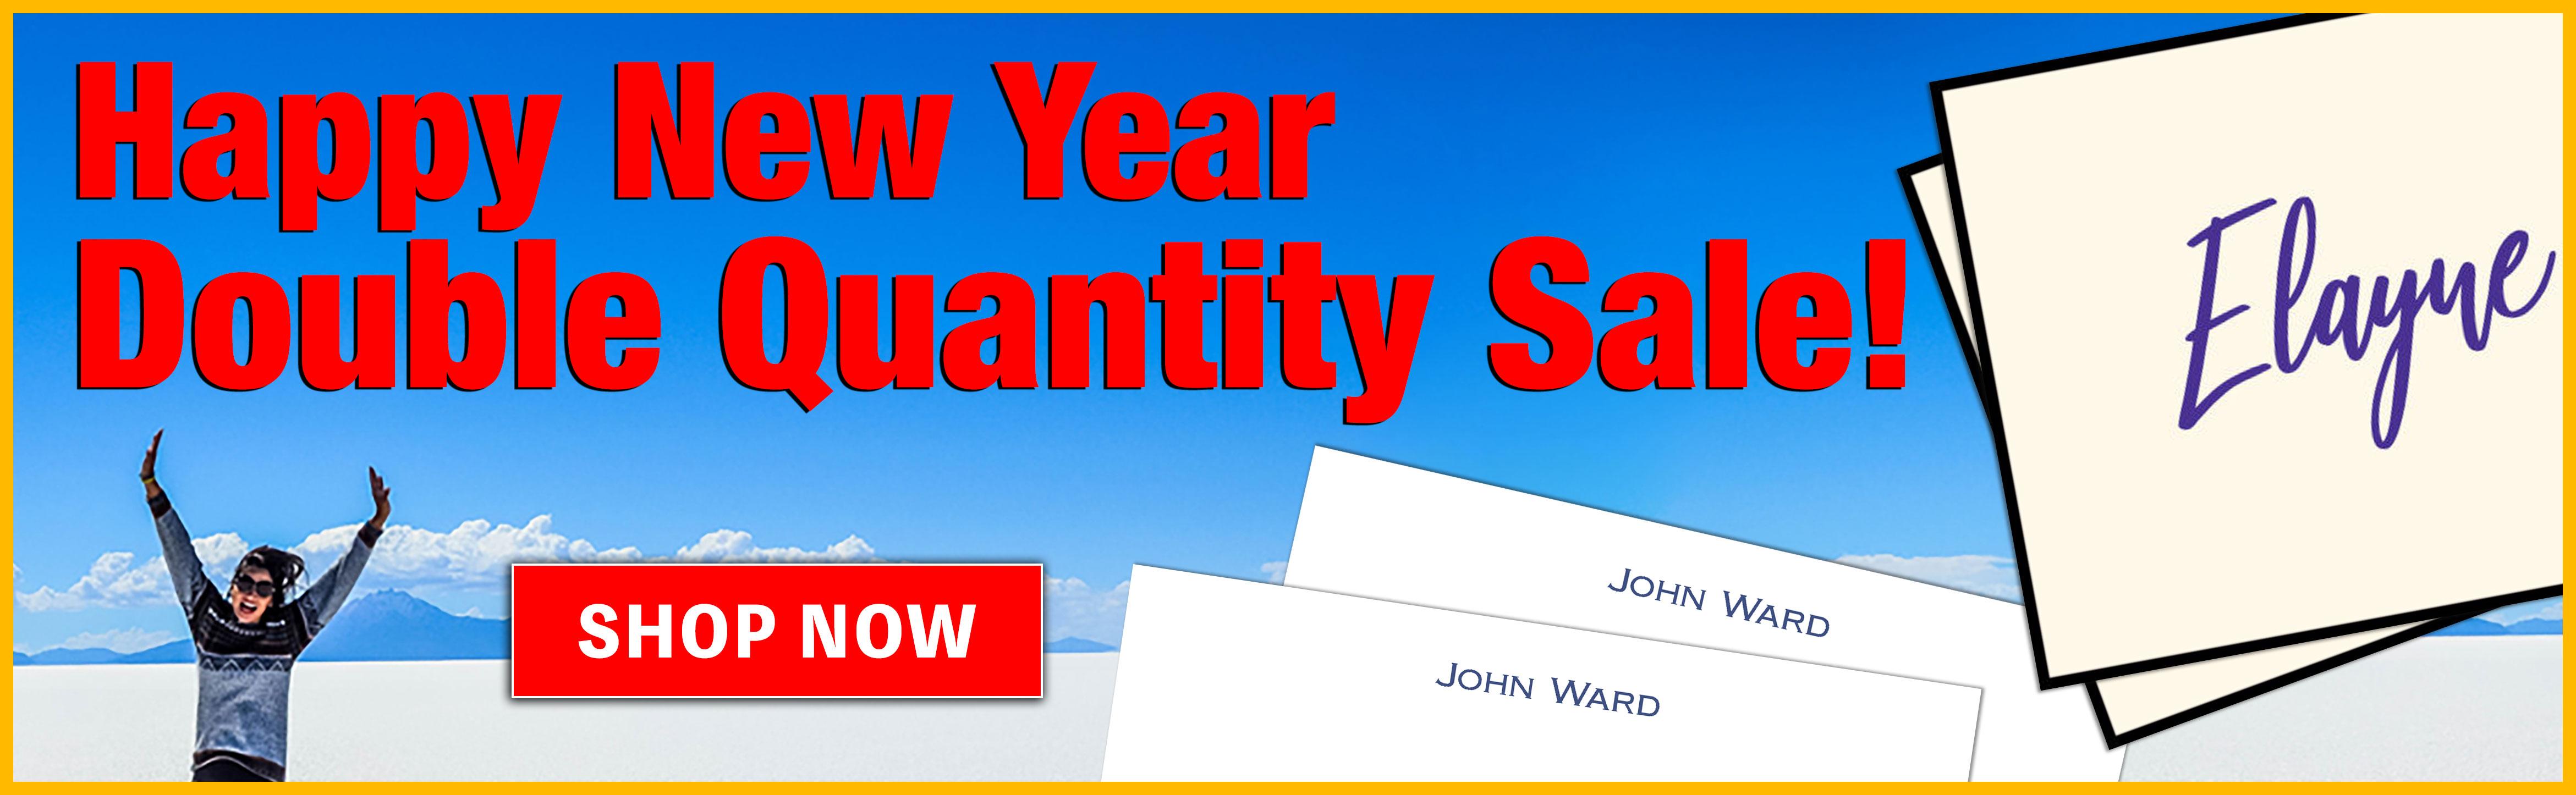 Double Quantity Sale at StationeryXpress.com!